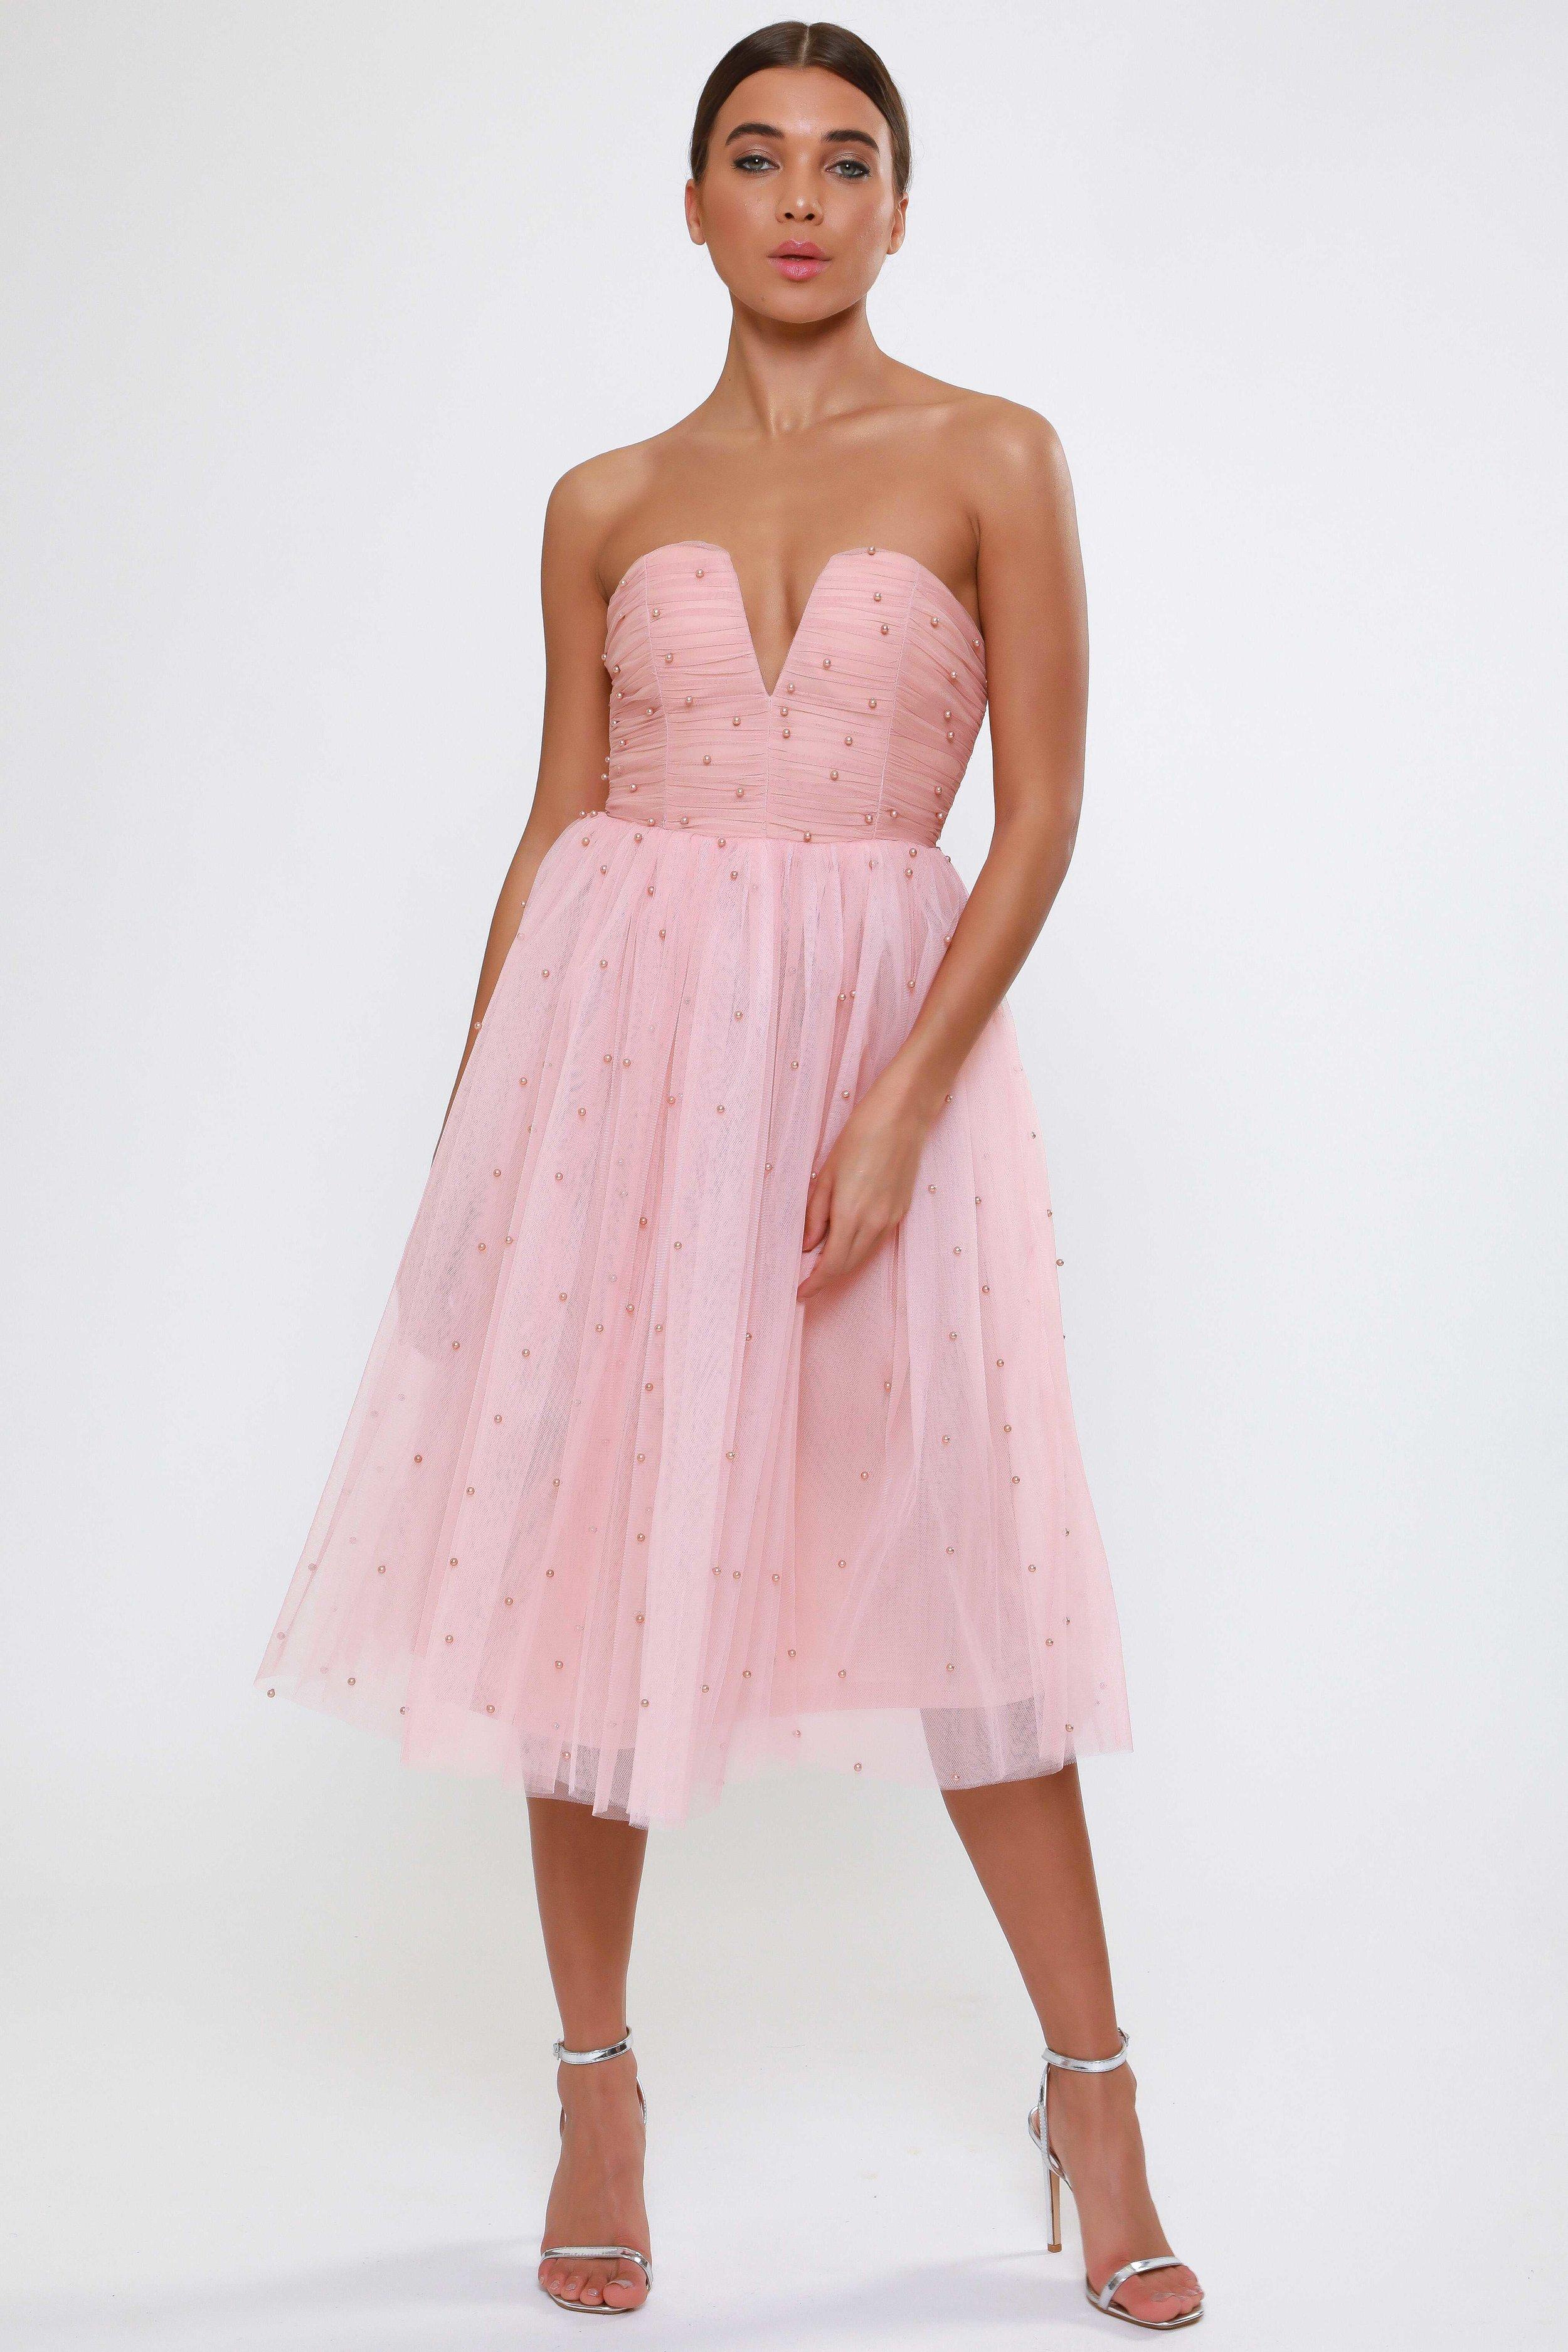 Pearl Embellished  Tutu Dress   £68.00